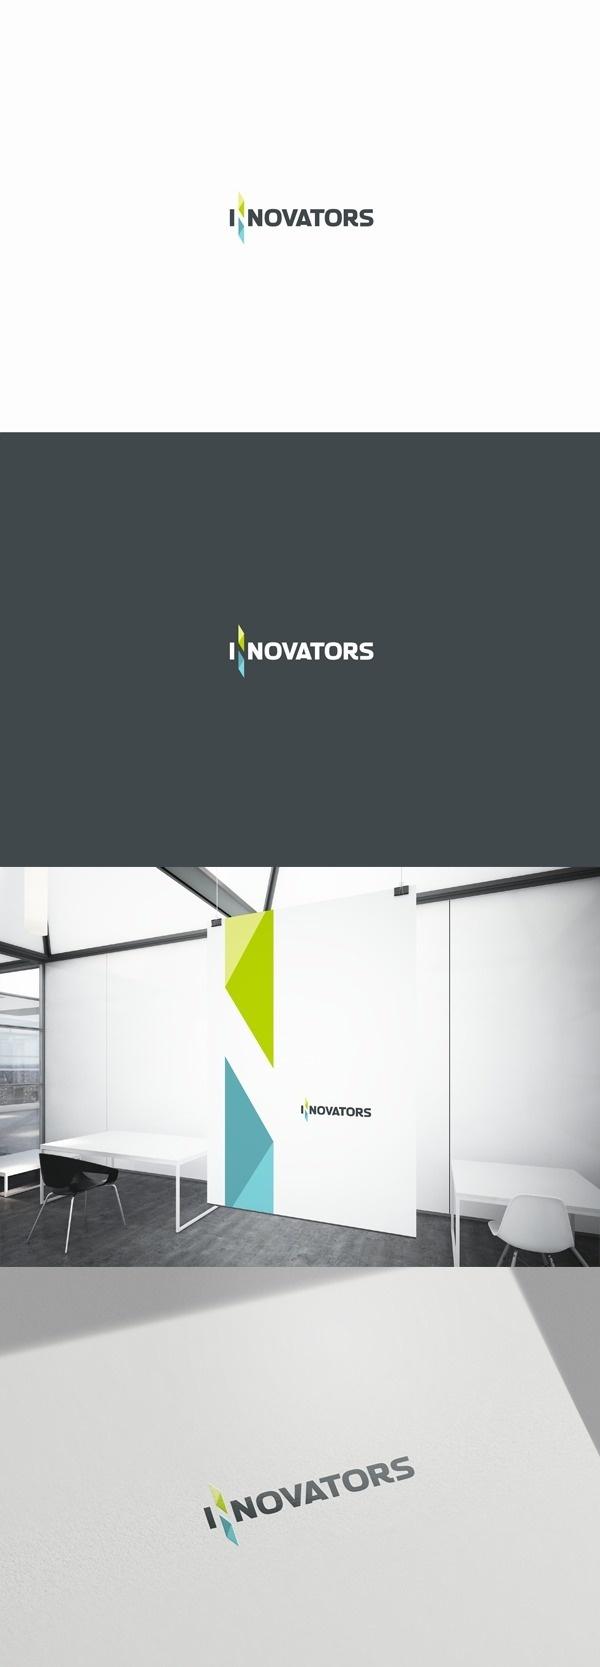 Innovators #logo #white #space